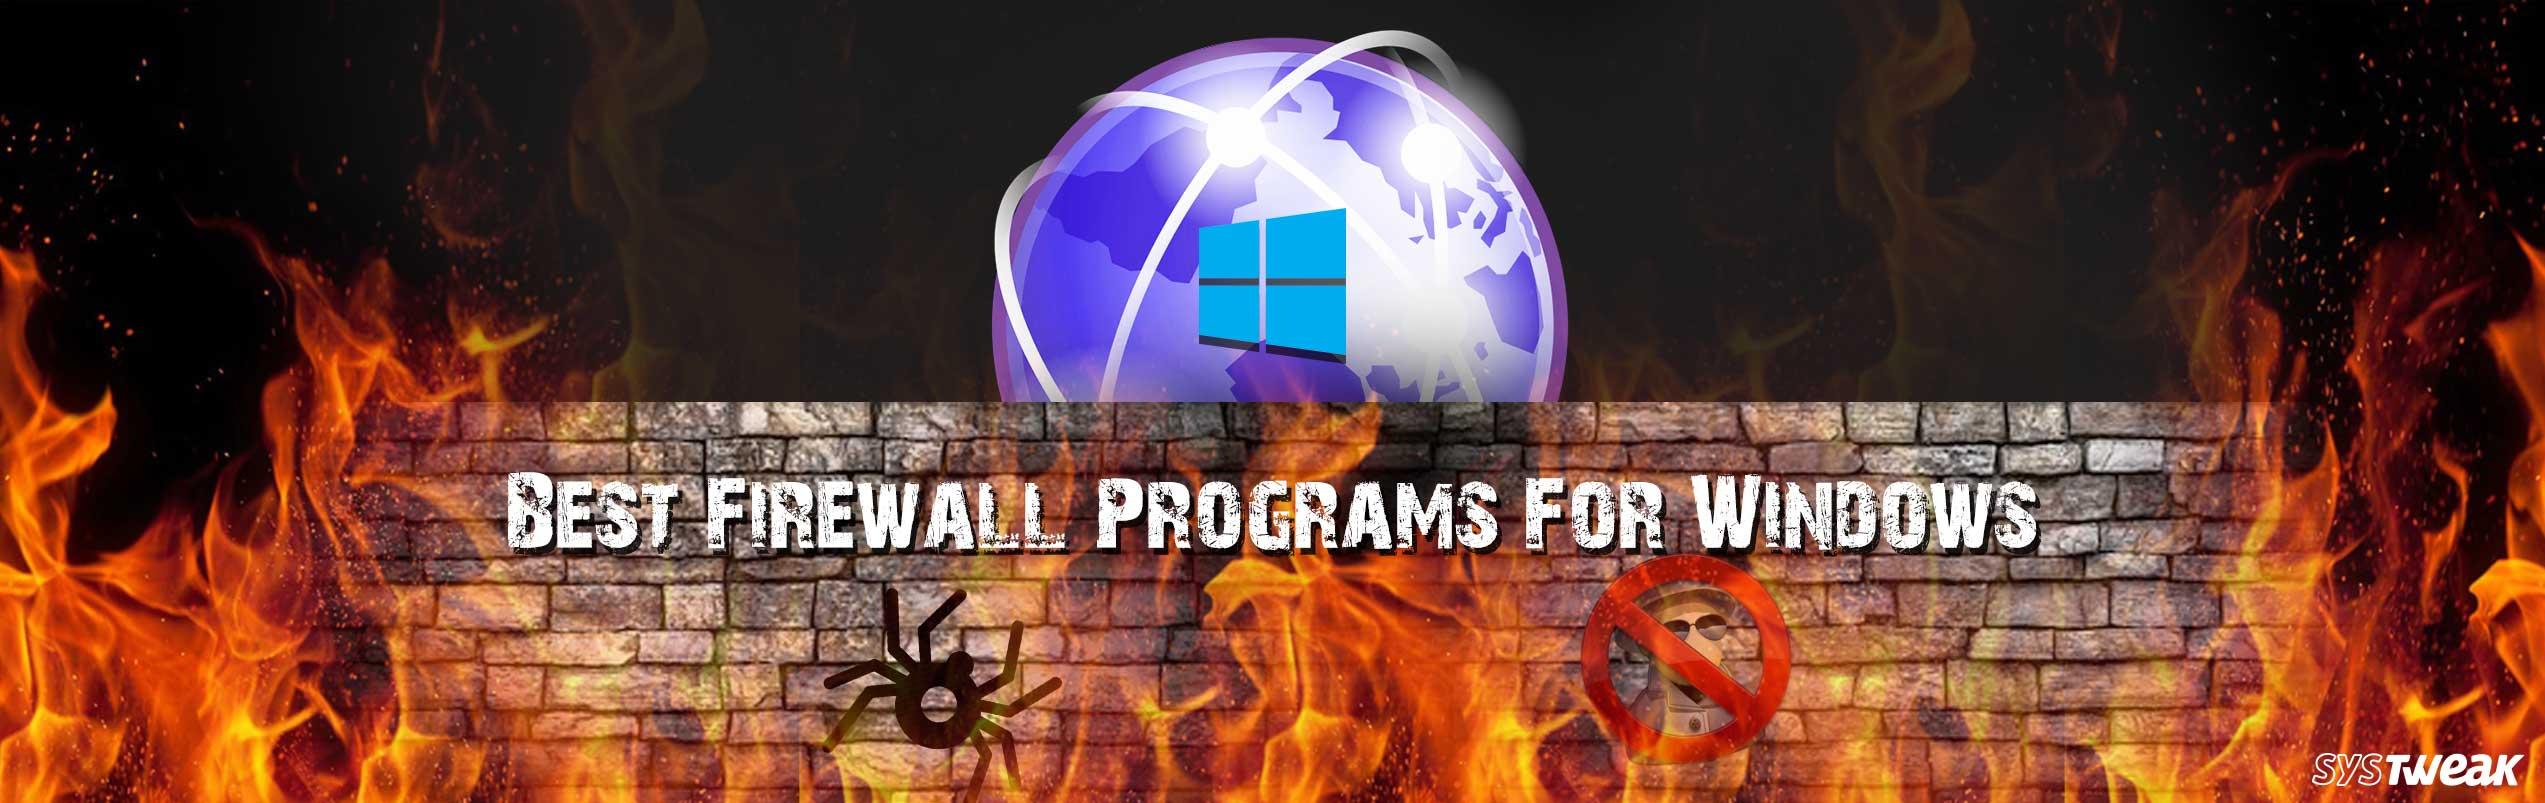 10 Best Free Firewall Software For Windows